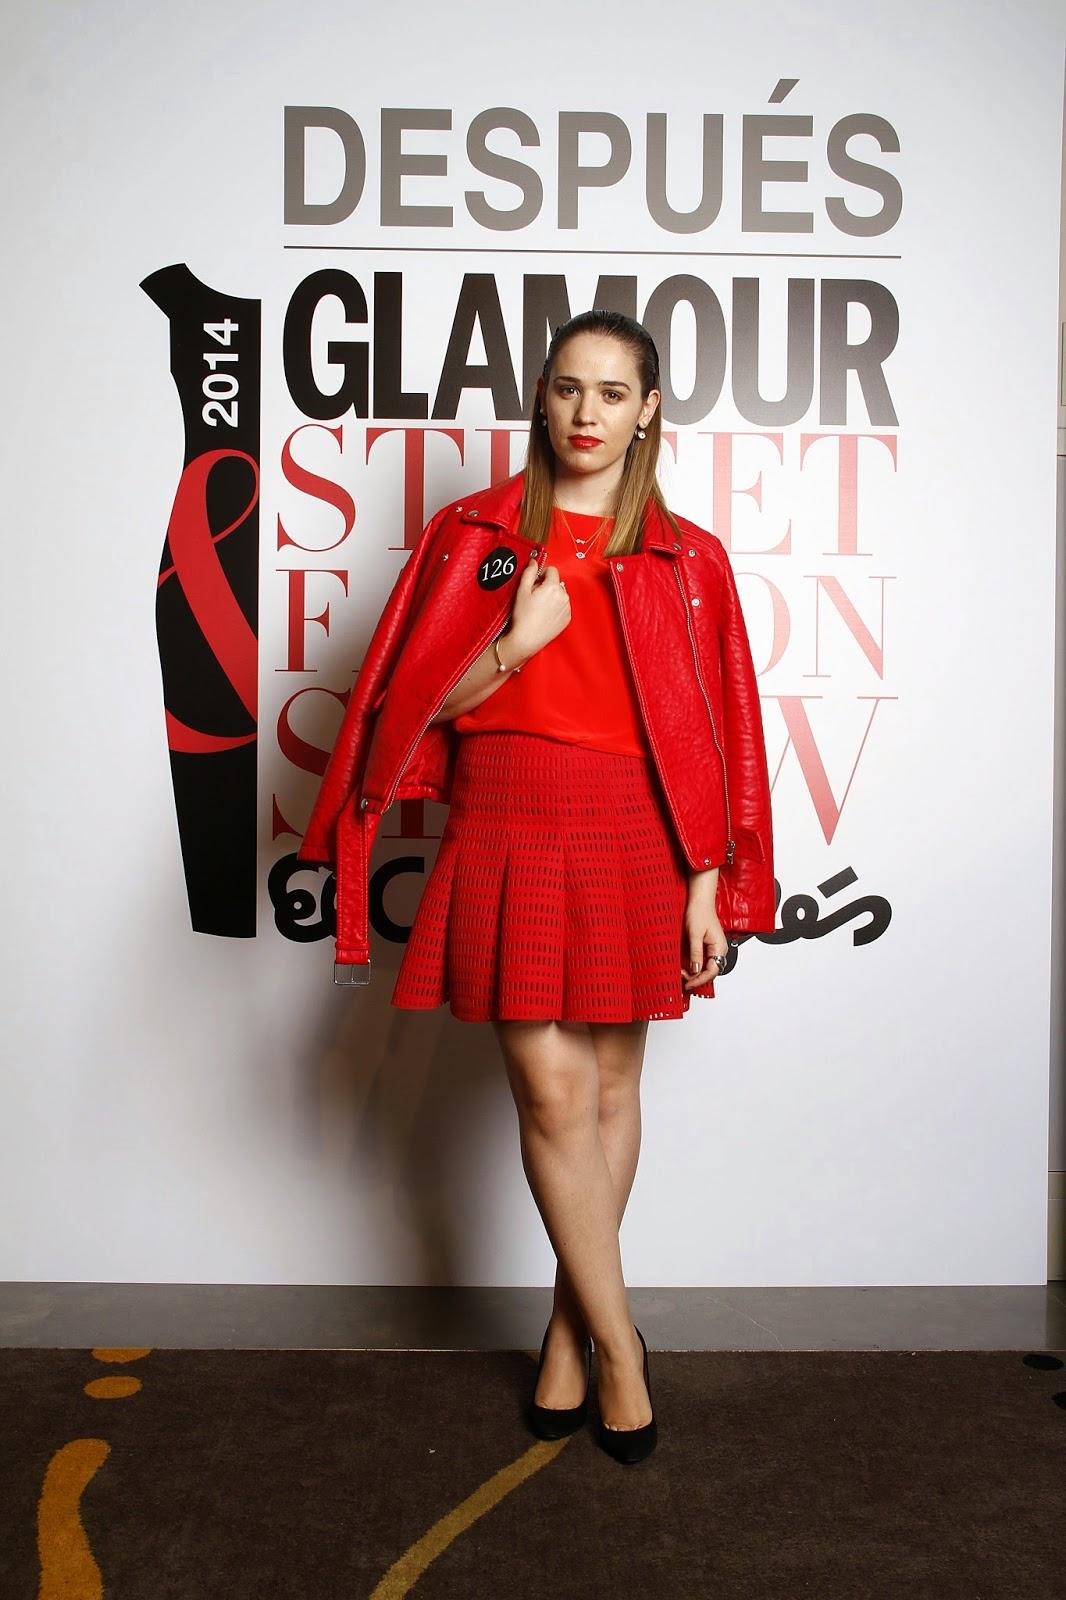 #GlamourStreetFashionShow El gran día